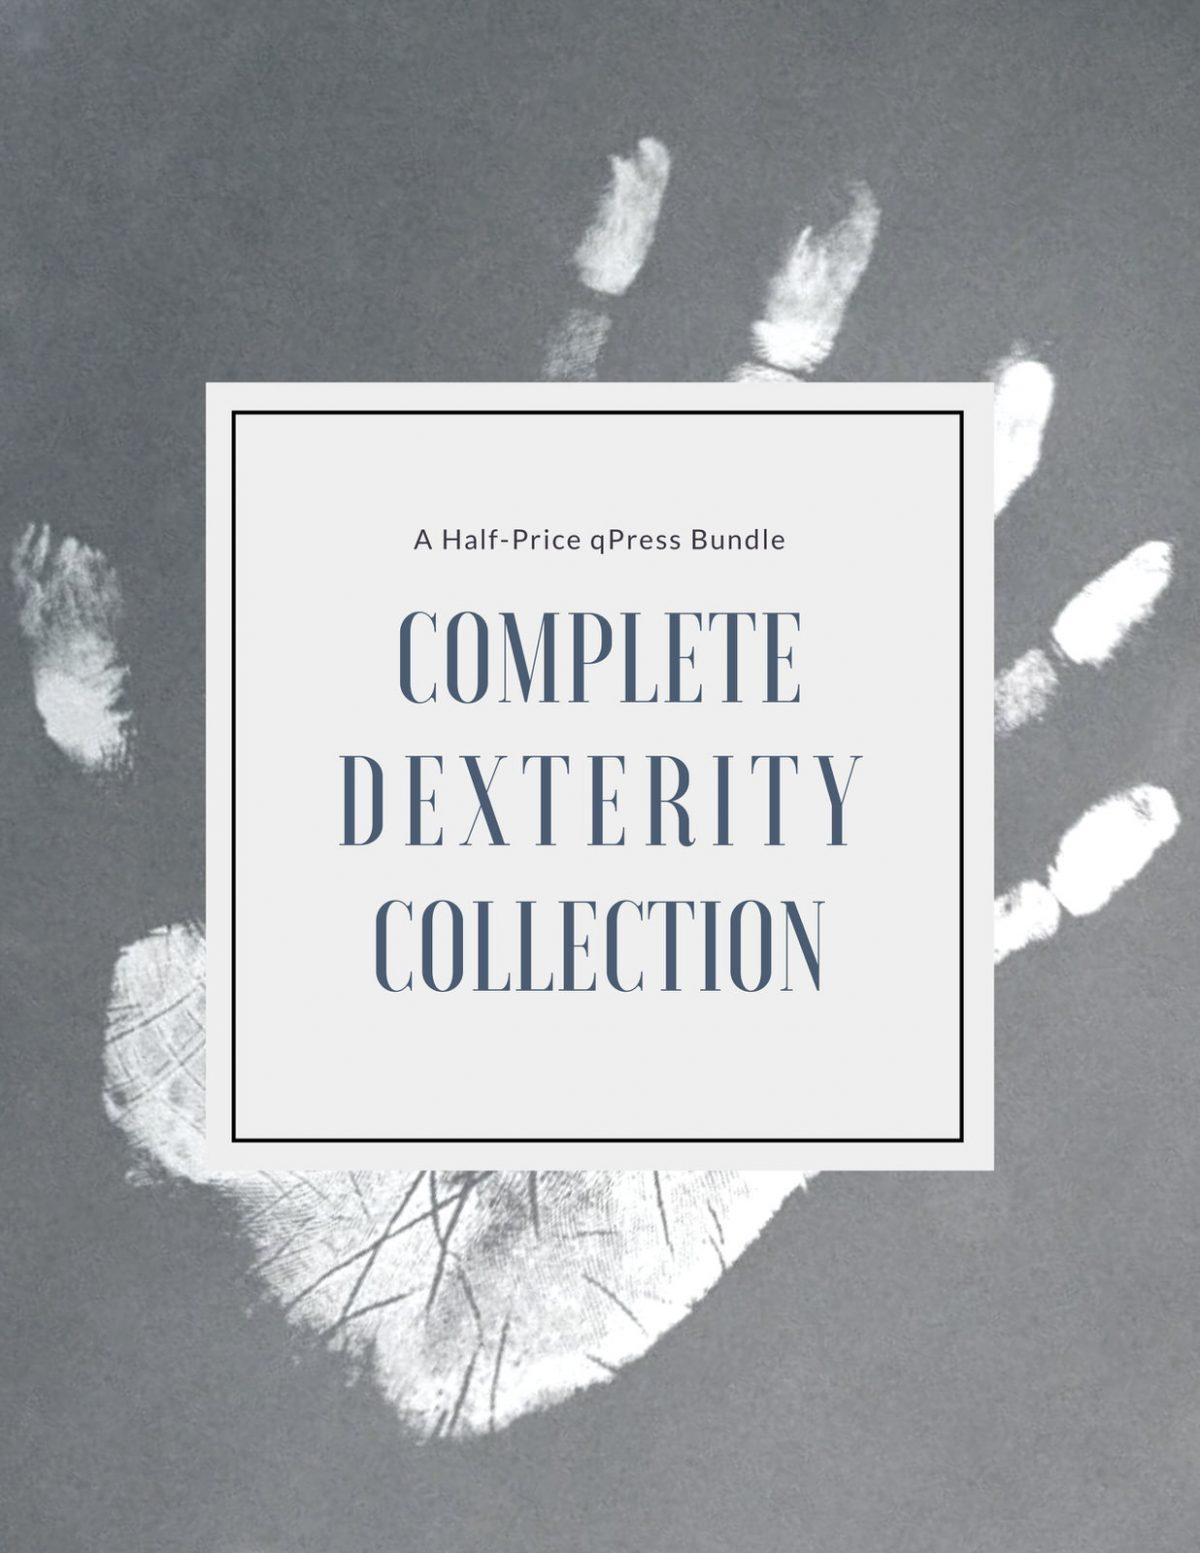 dexterity cover-1